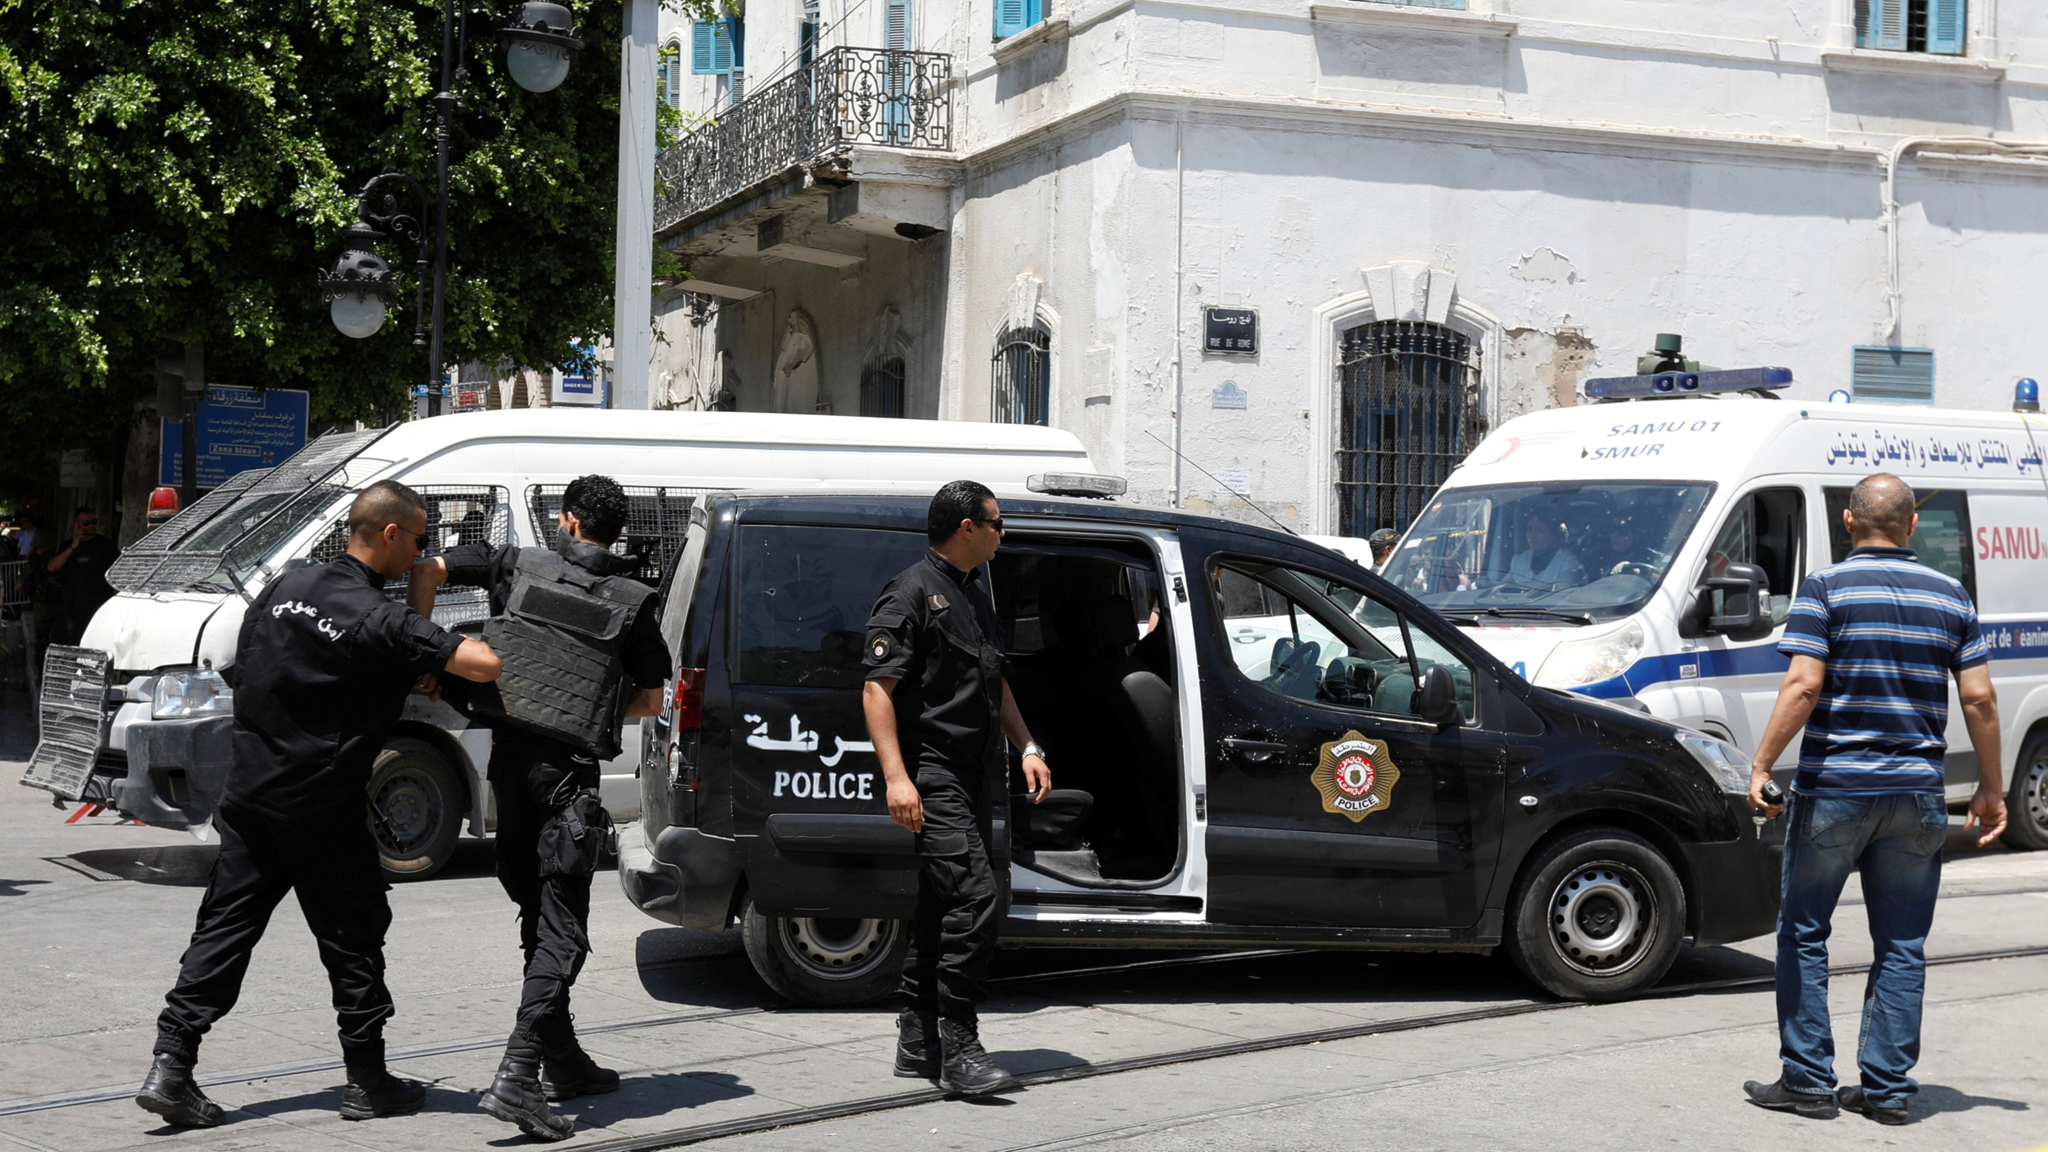 ansluta sig i Tunisien enda sallad online dating